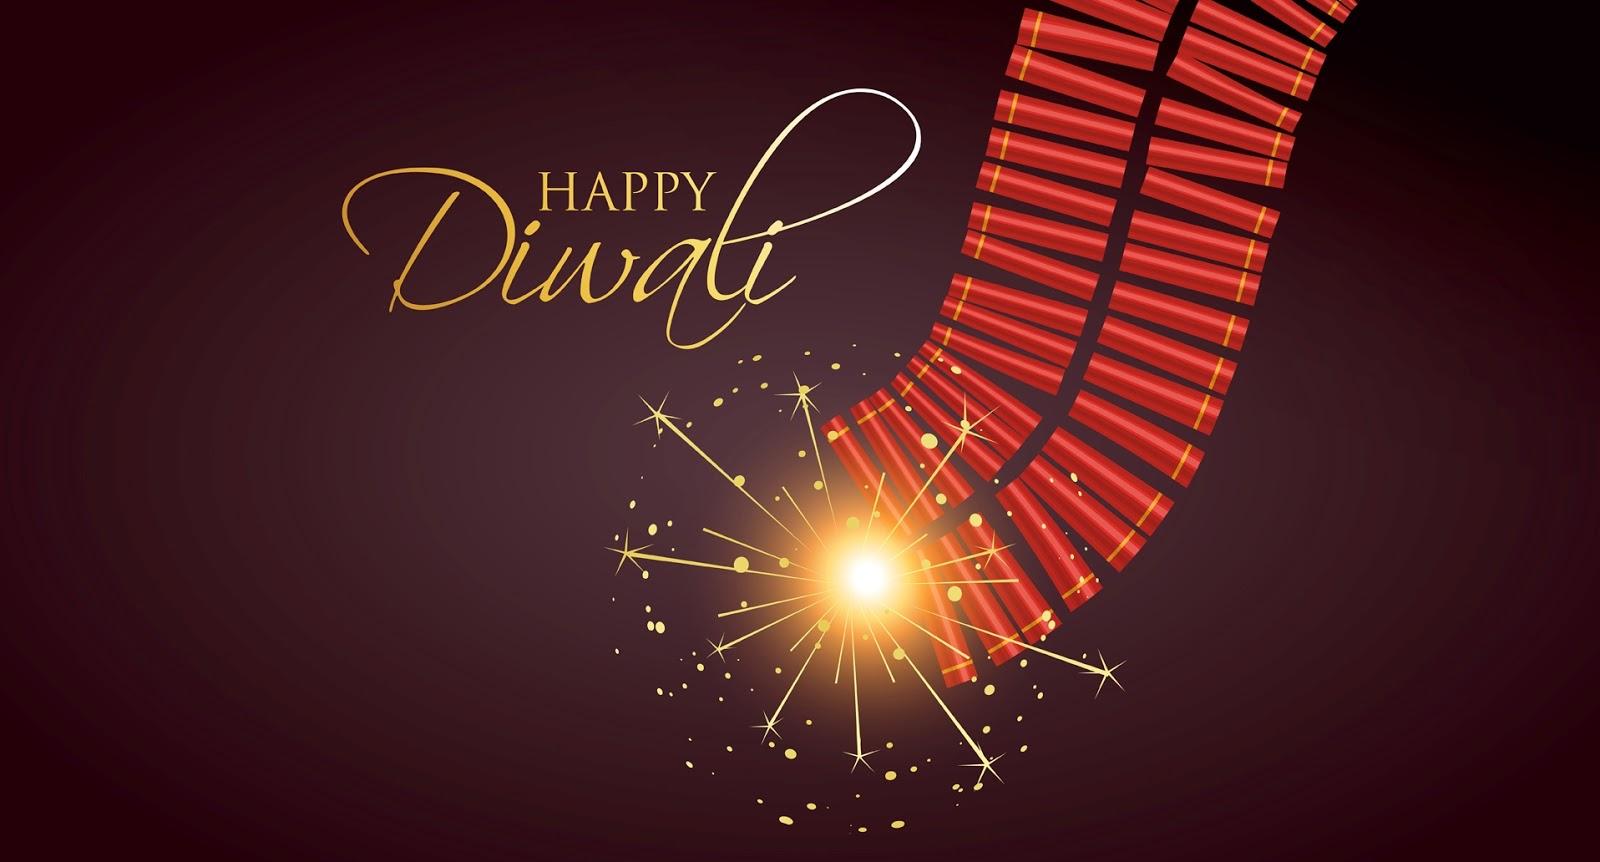 100 Happy Diwali HD Wallpapers 2017